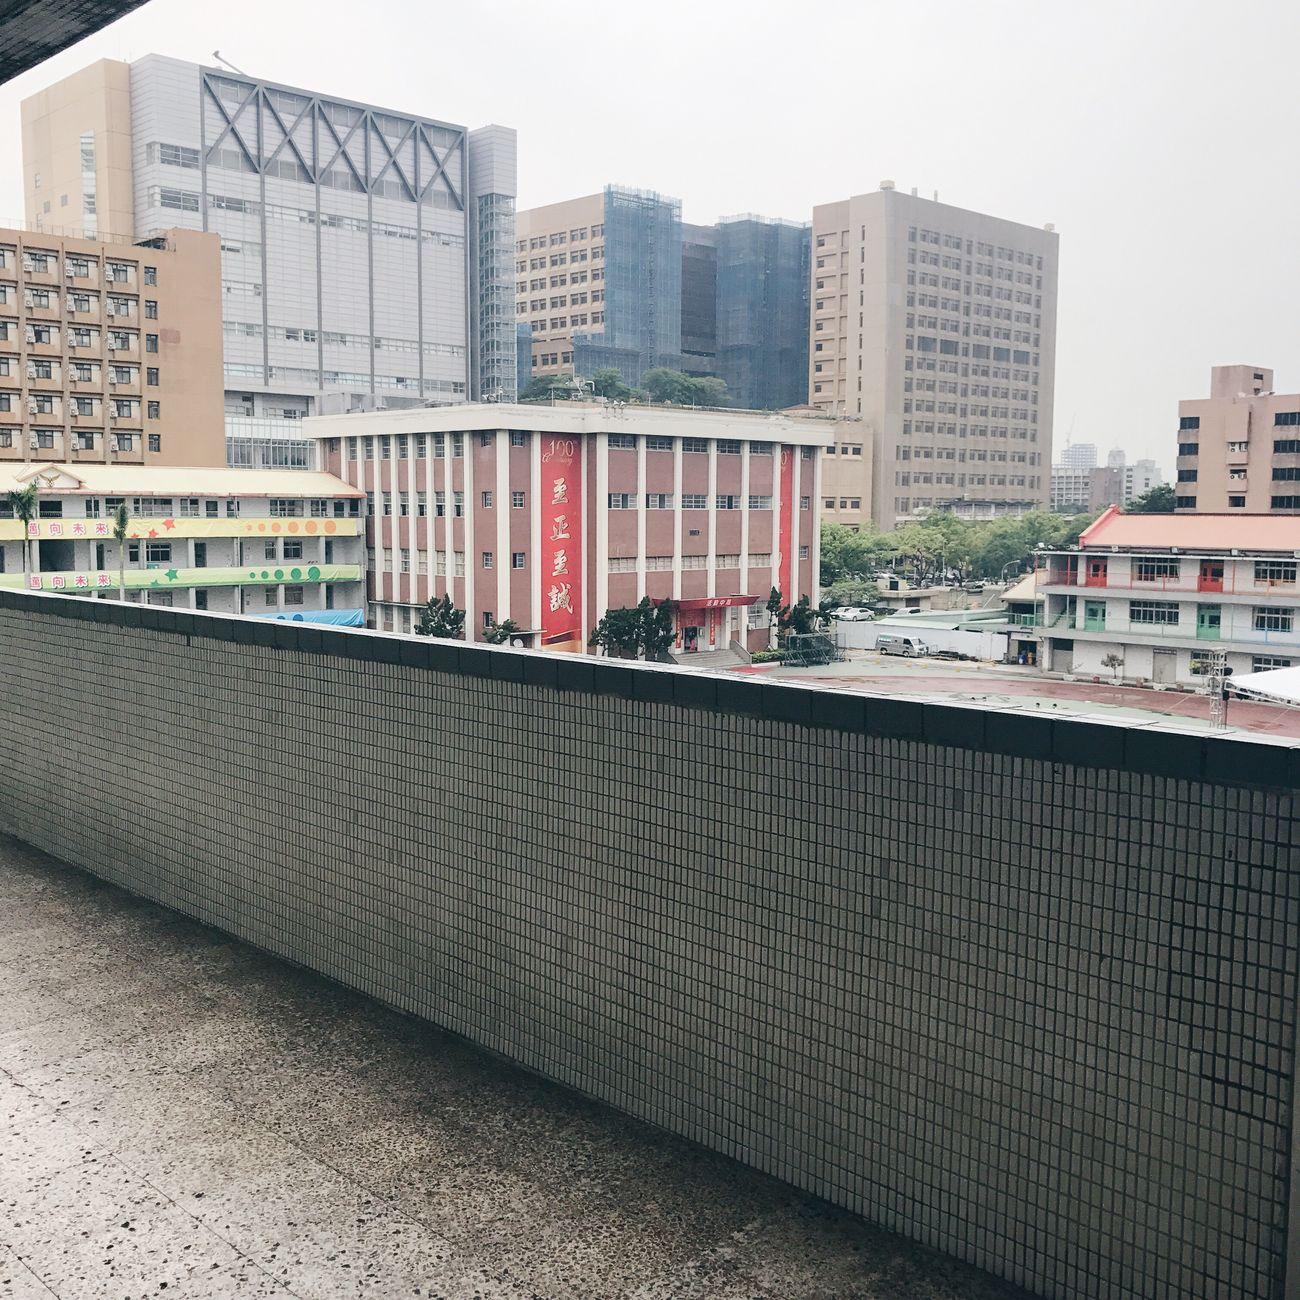 20170422 又來考試了 今天很冷 街道💕 City EyeEm VSCO Taiwan Kate's Daily Vscocam Photography Yolo Hello World